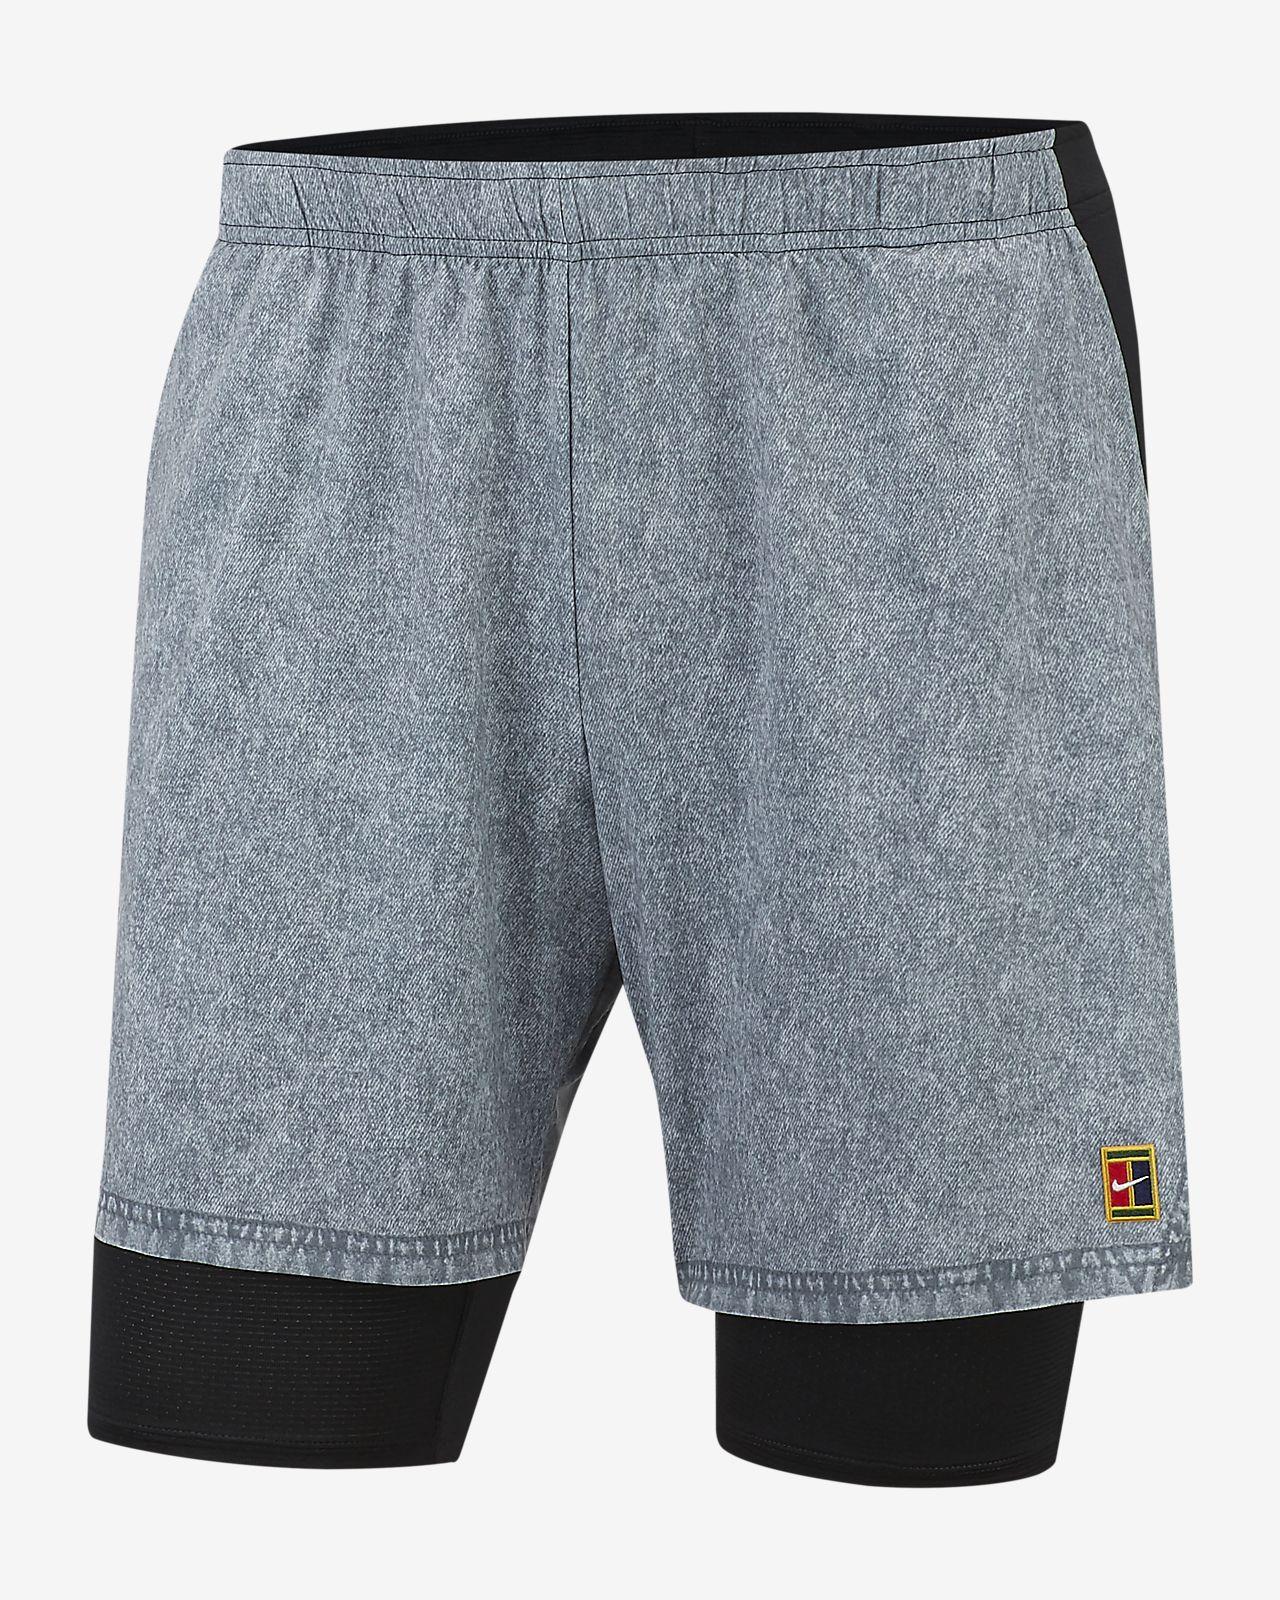 Shorts da tennis stampati NikeCourt Flex Ace - Uomo